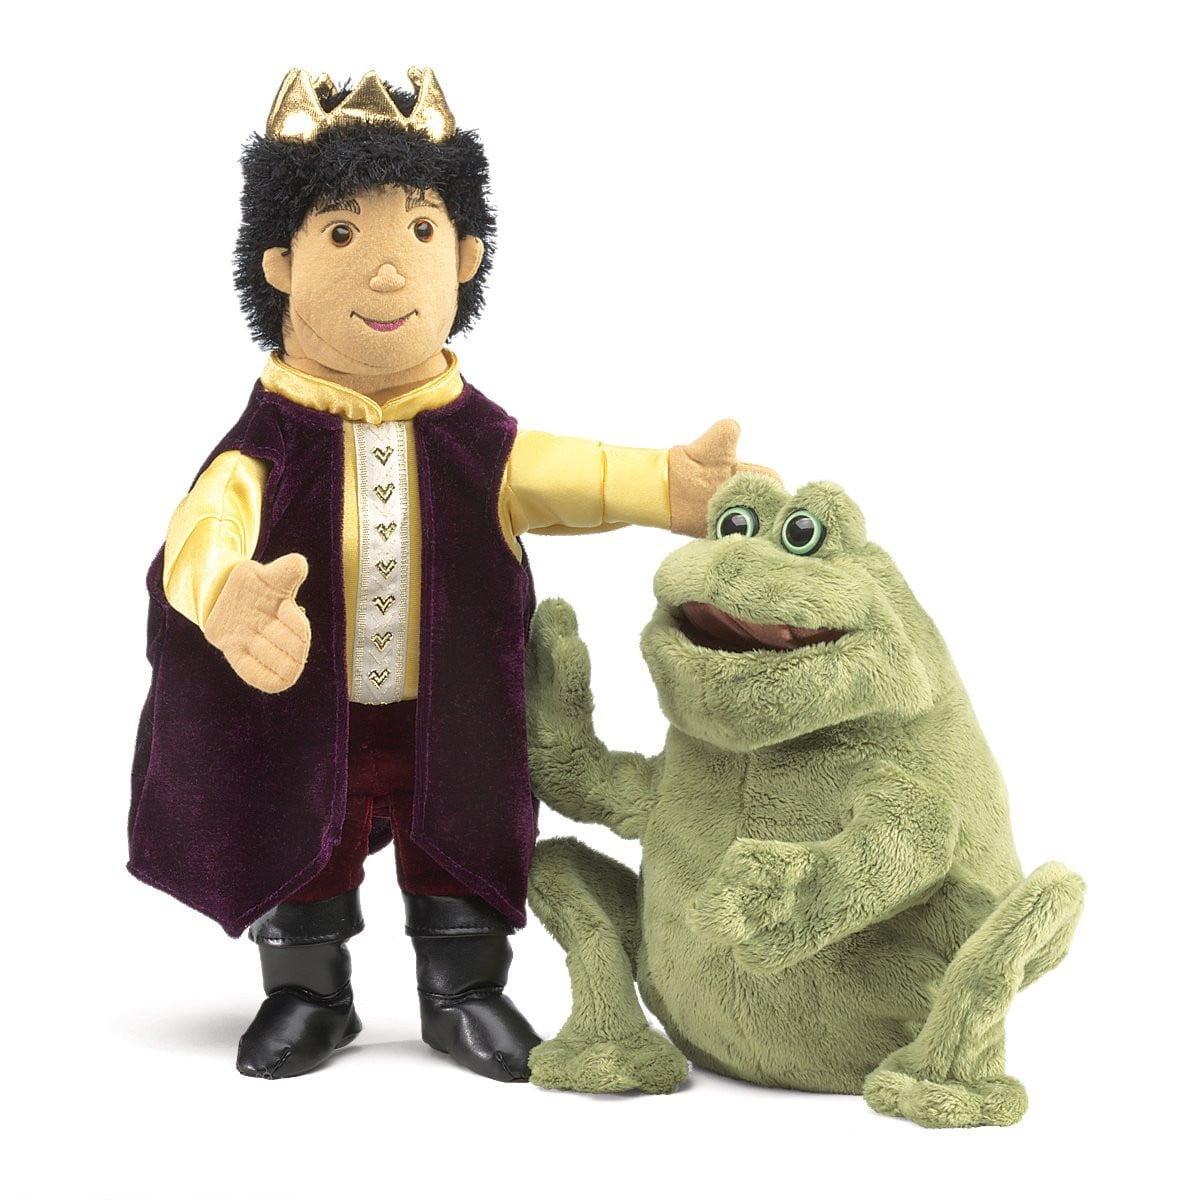 Folkmanis 2826 Frog Prince Reversible Puppet